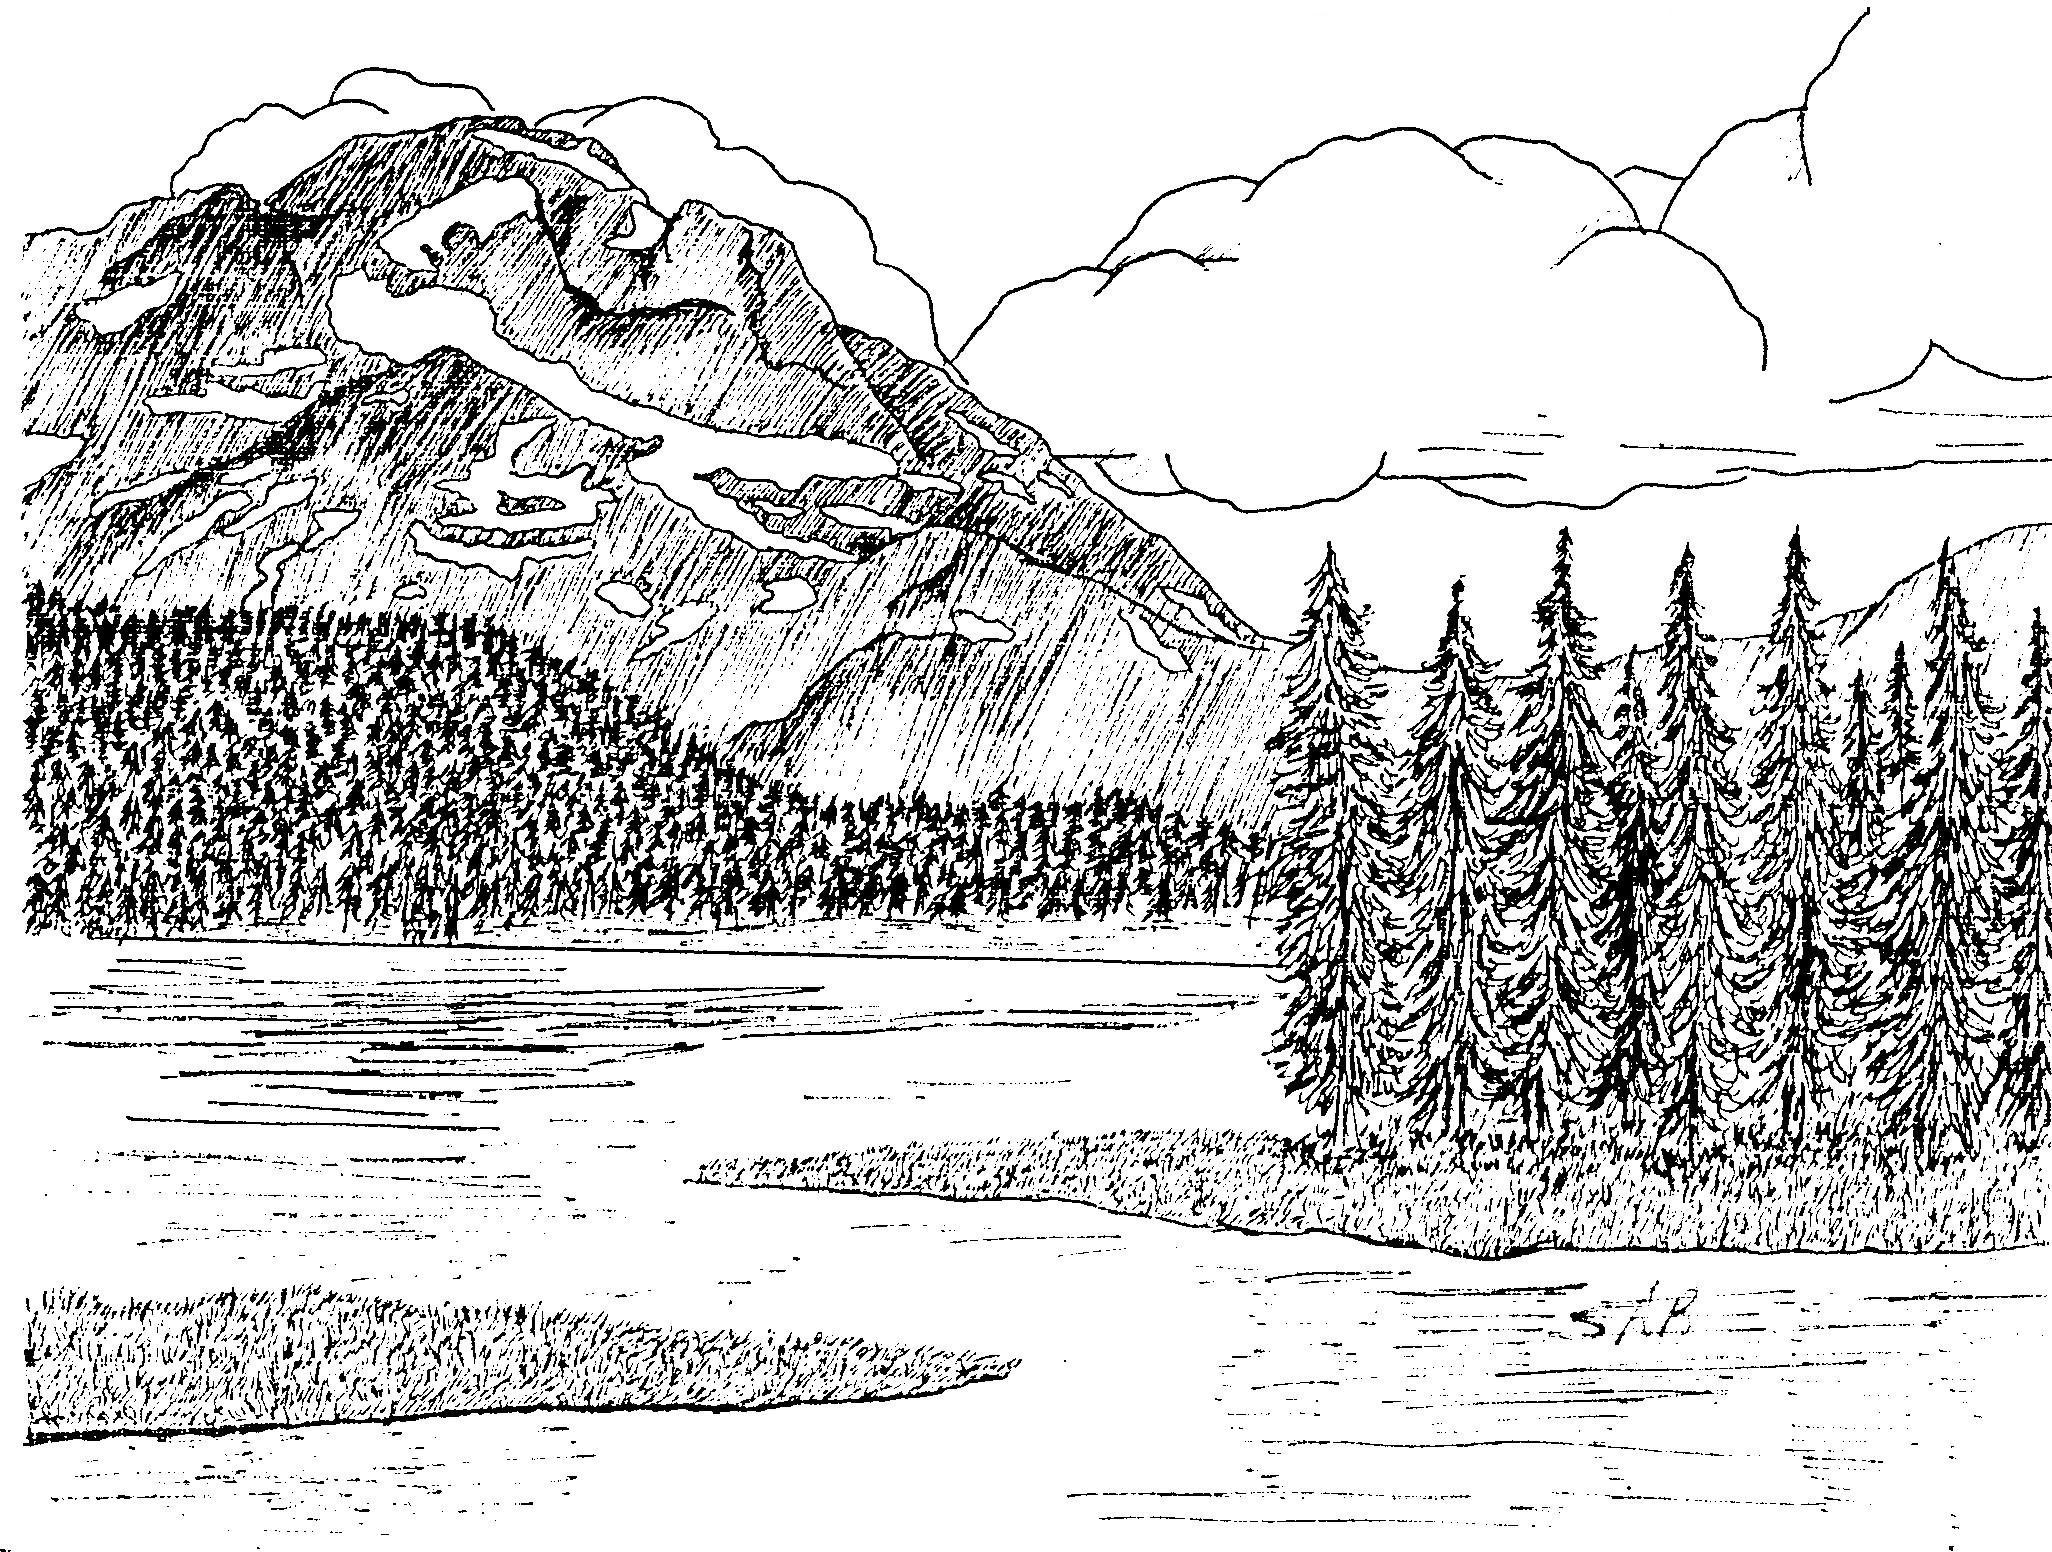 Landscapes In Pen And Ink